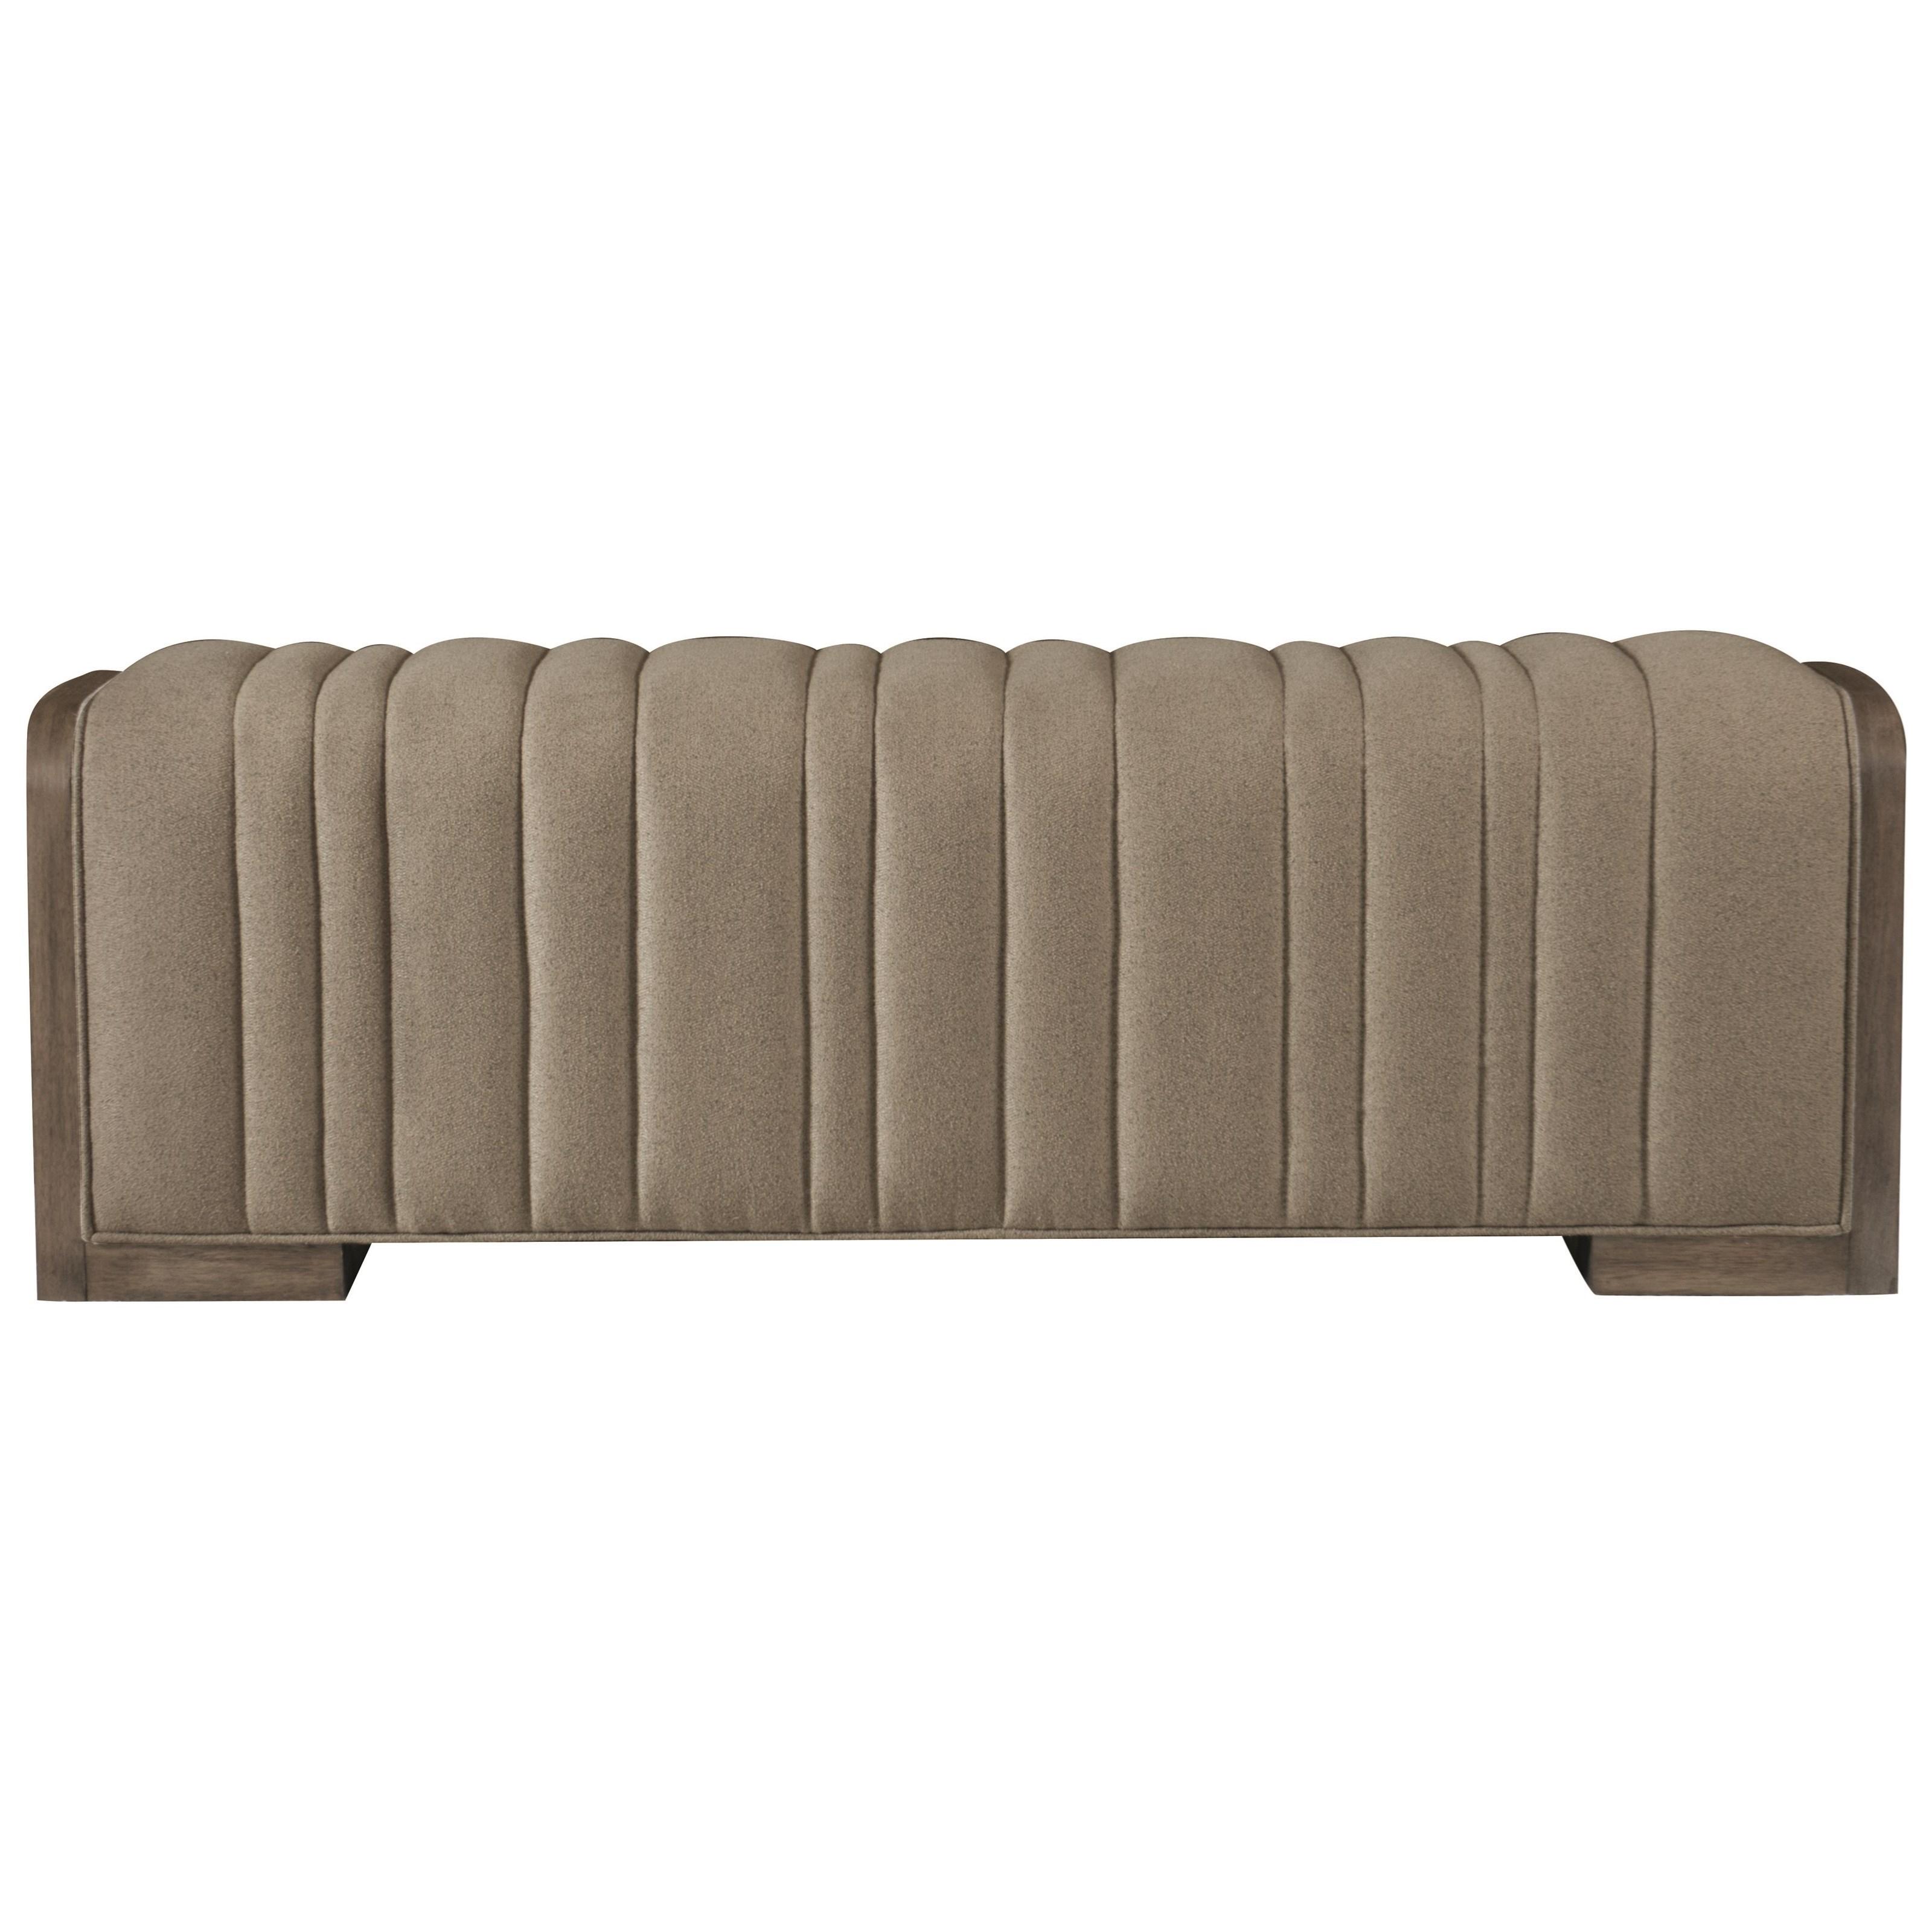 Profile Upholstered Bench by Bernhardt at Baer's Furniture